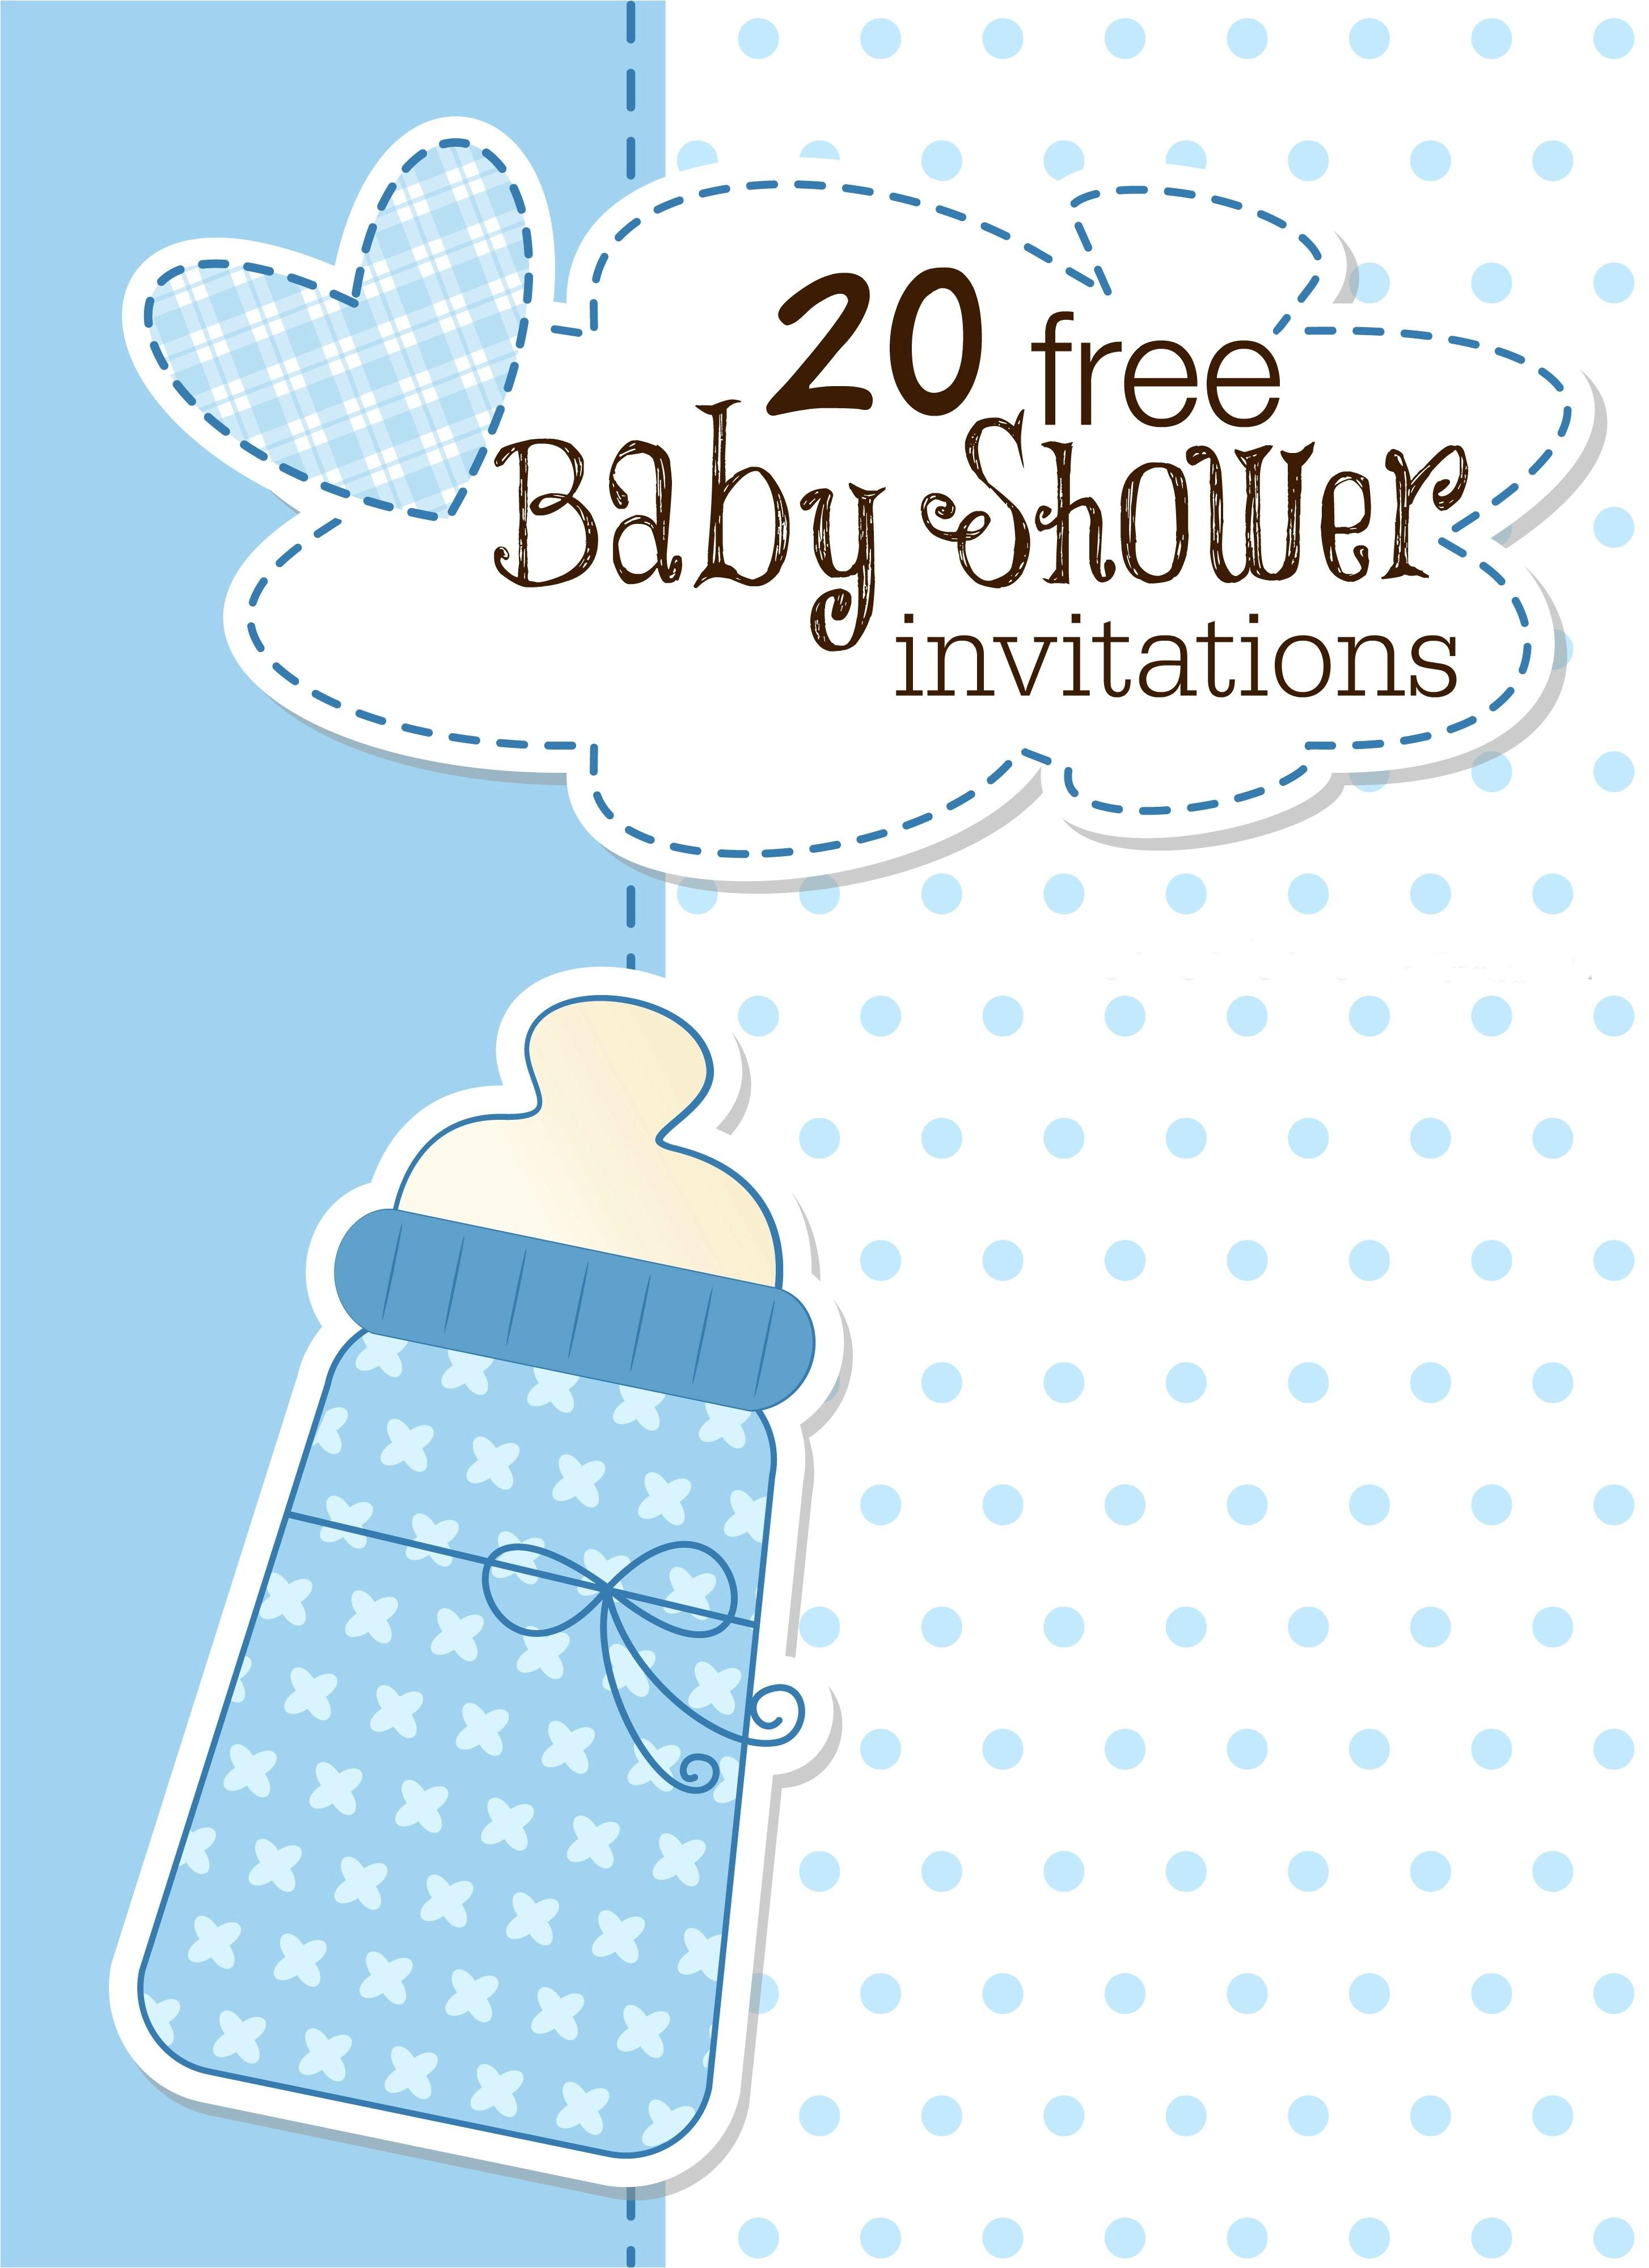 Make Free Baby Shower Invitations Baby Shower Invitations Free Templates